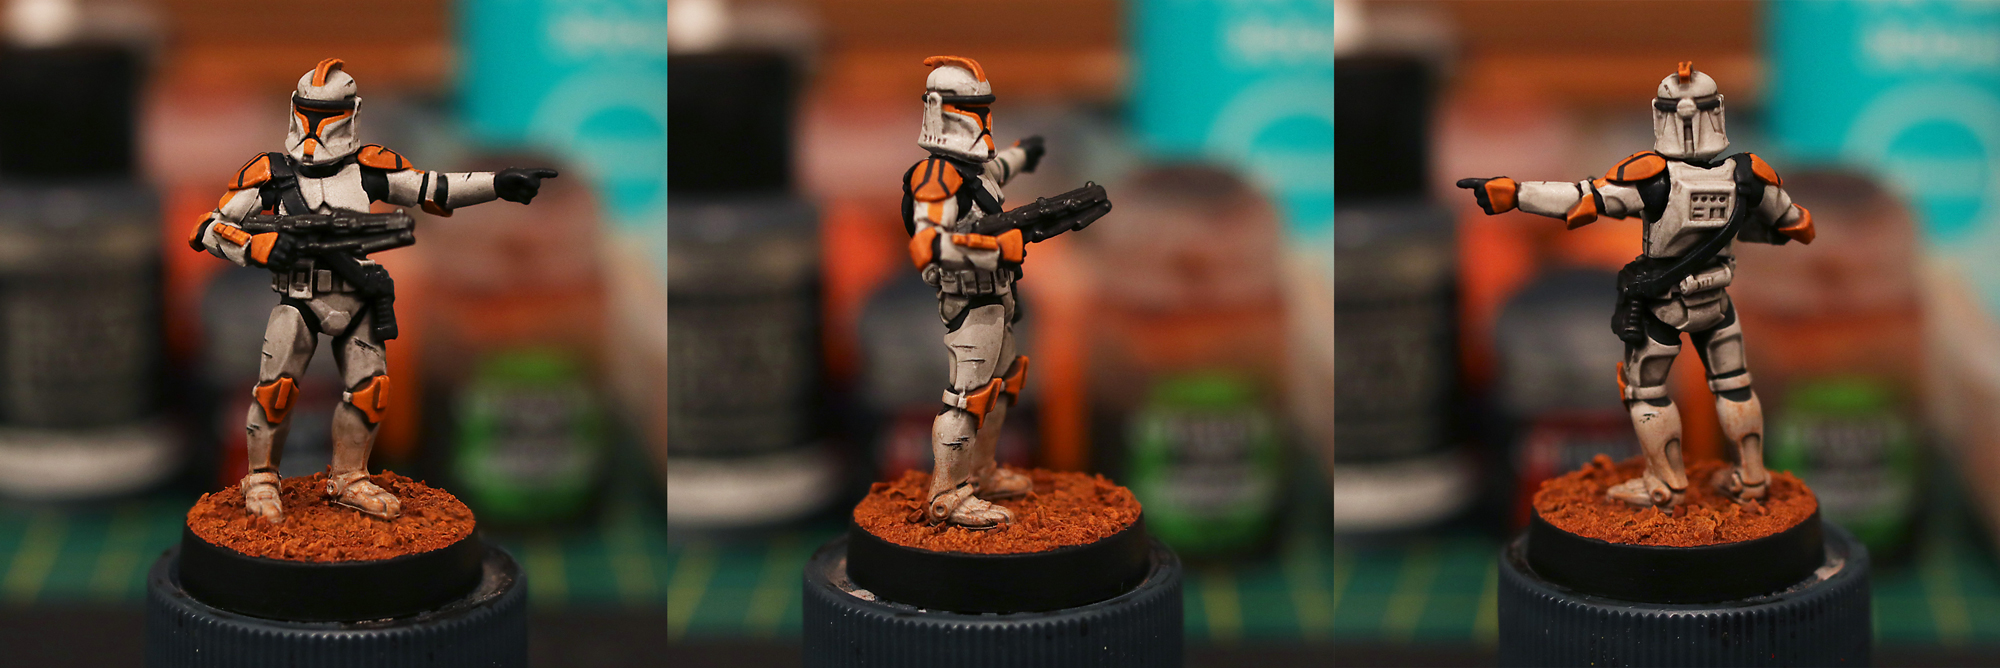 clone-leader.jpg